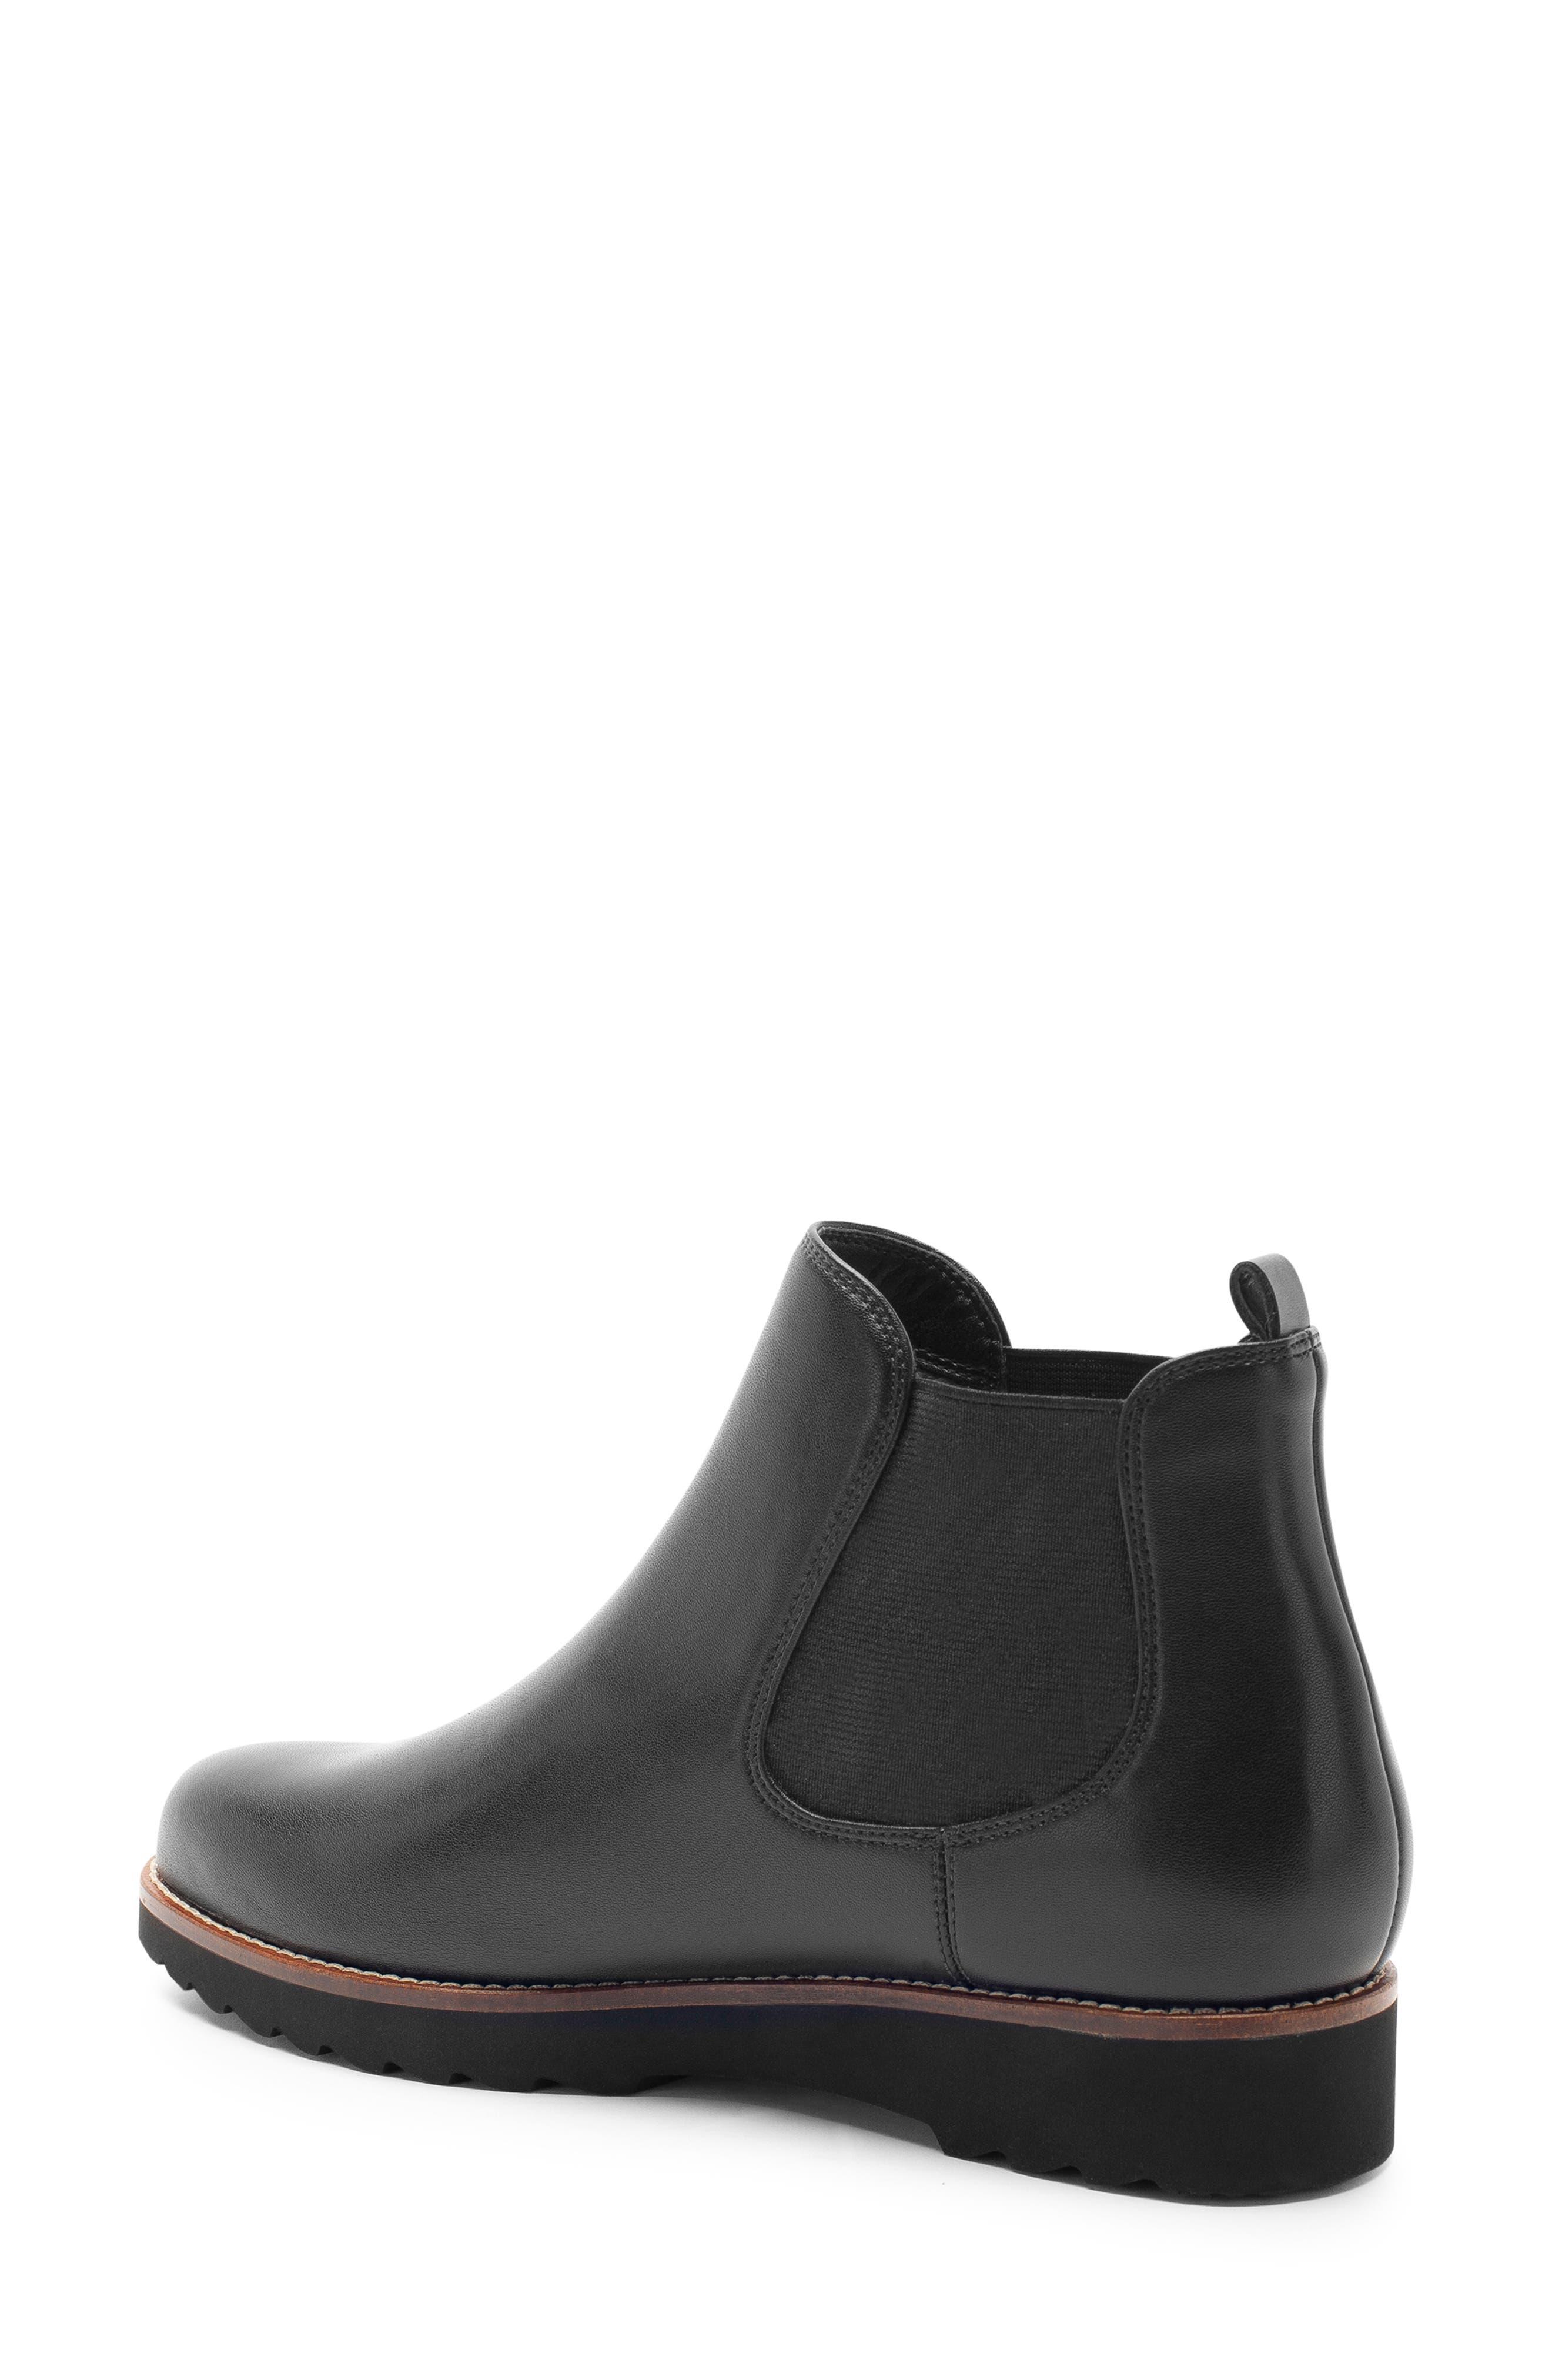 Roman Waterproof Bootie,                             Alternate thumbnail 2, color,                             Black Leather